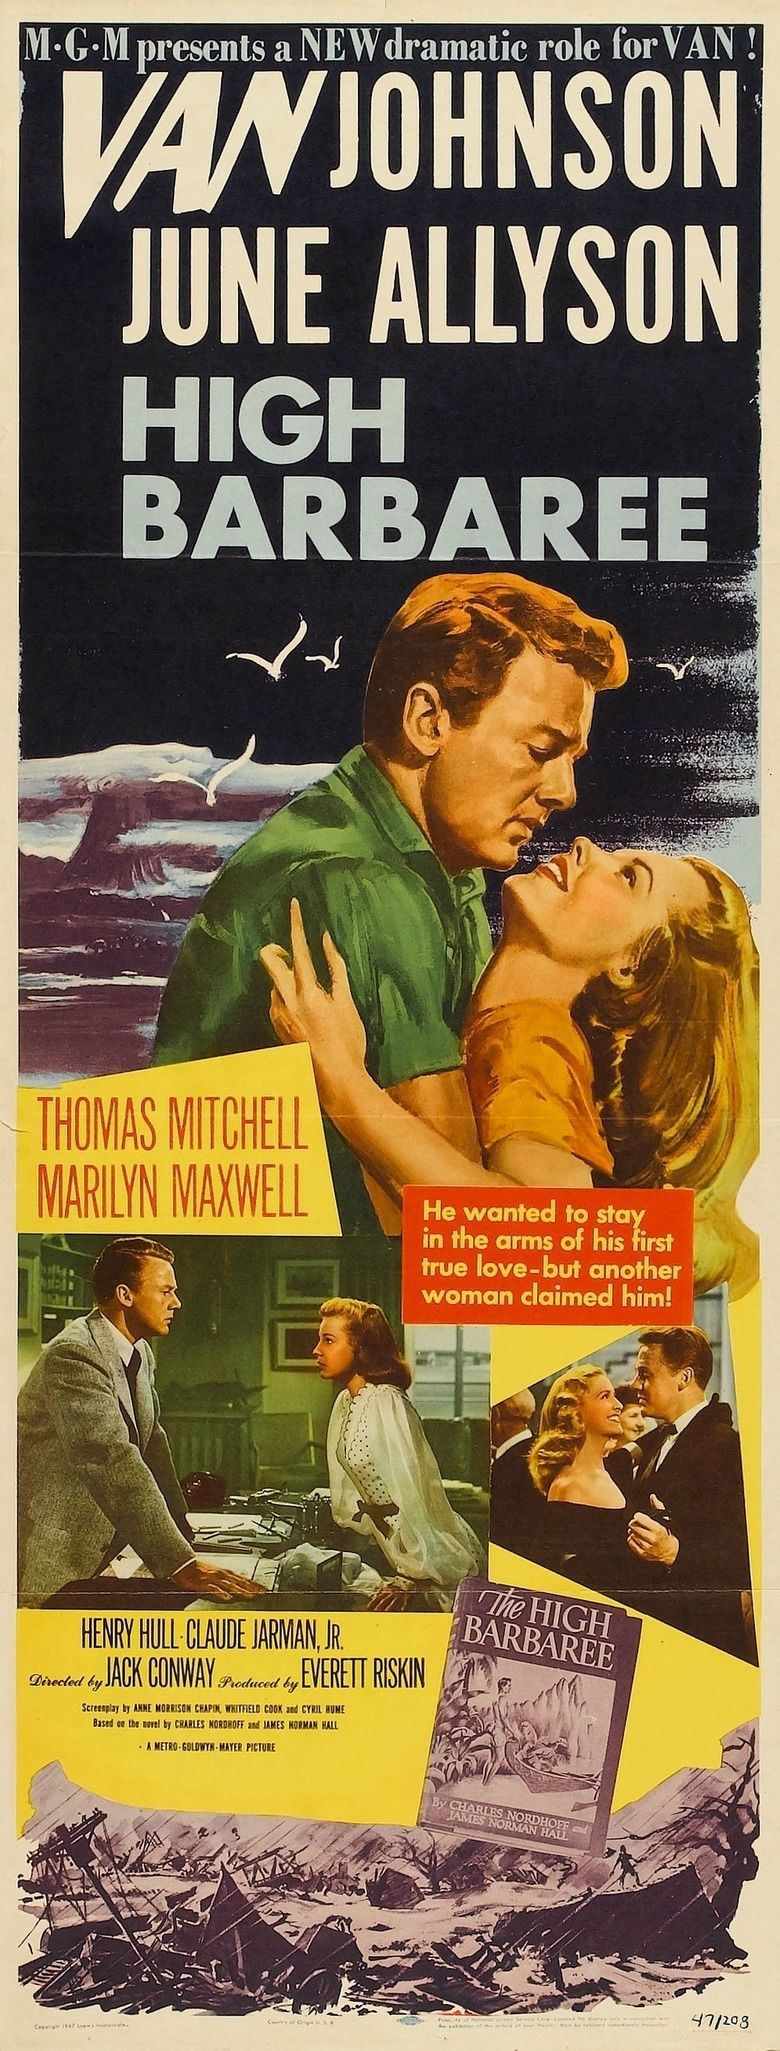 High Barbaree (film) movie poster